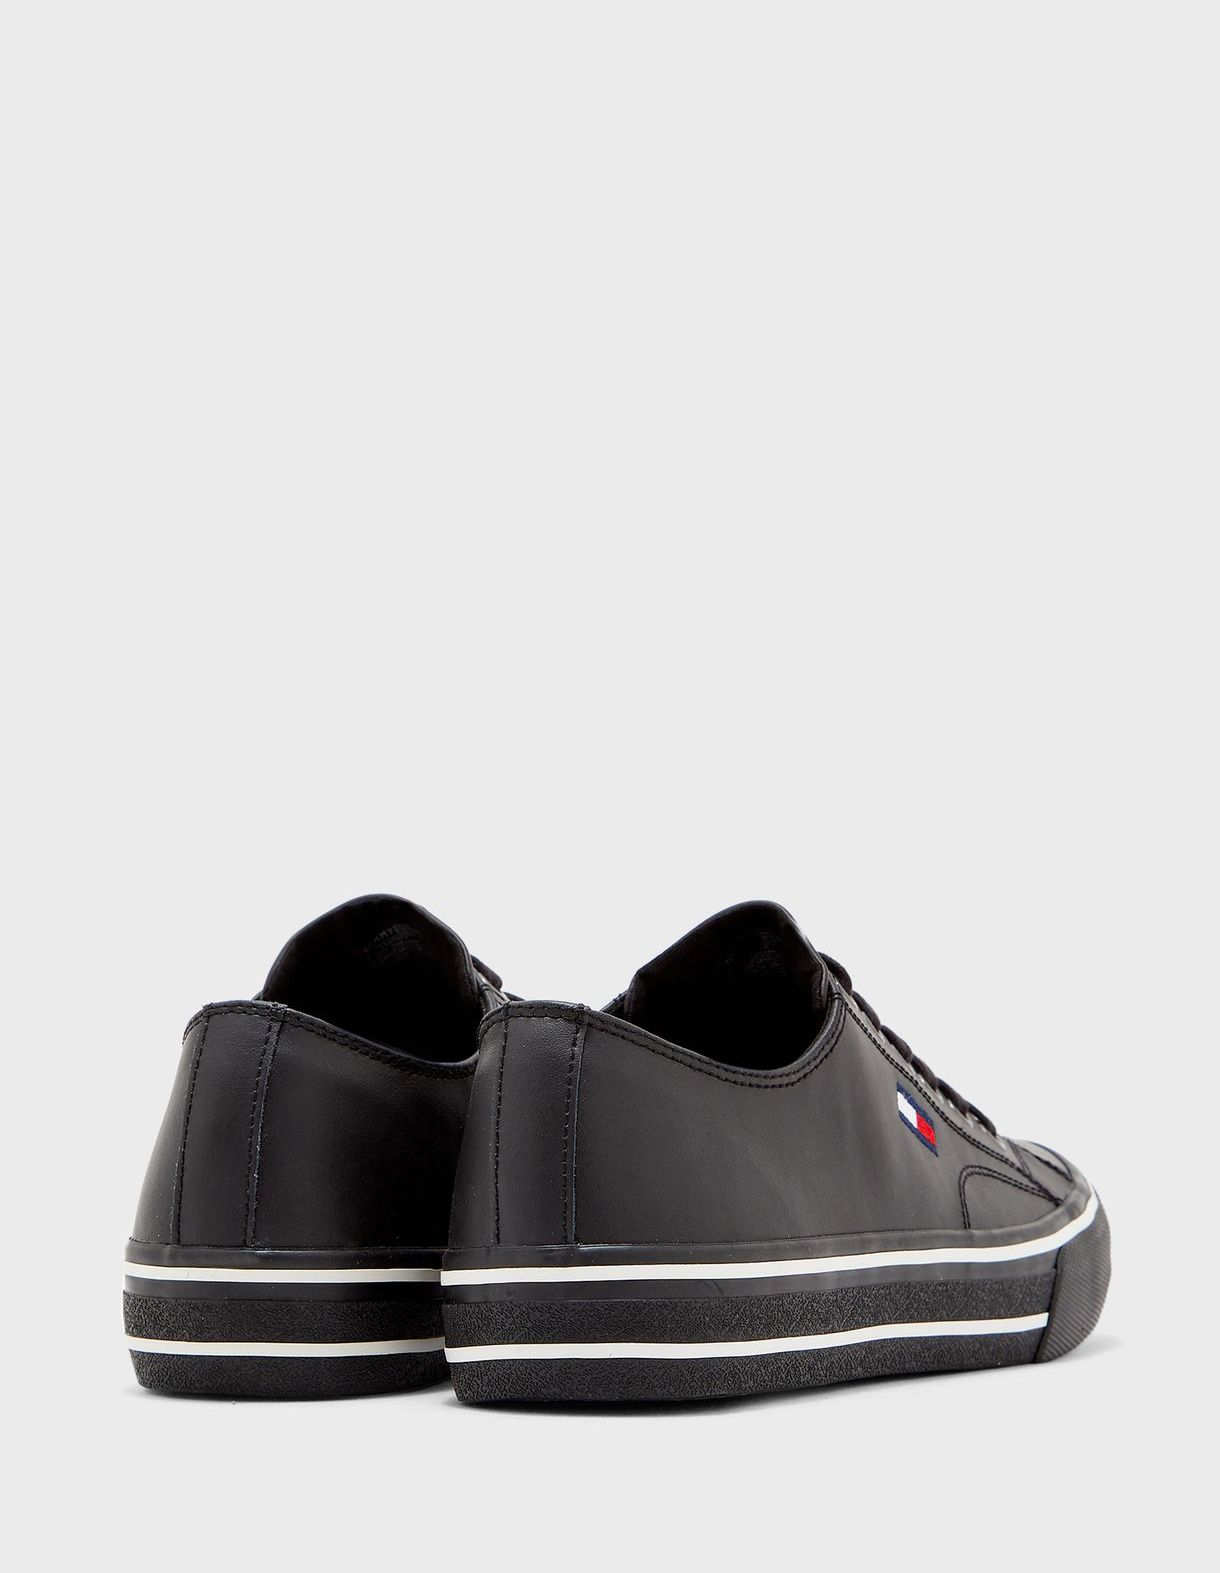 Кроссовки для мужчин Tommy Hilfiger TE997 размеры обуви, 2017